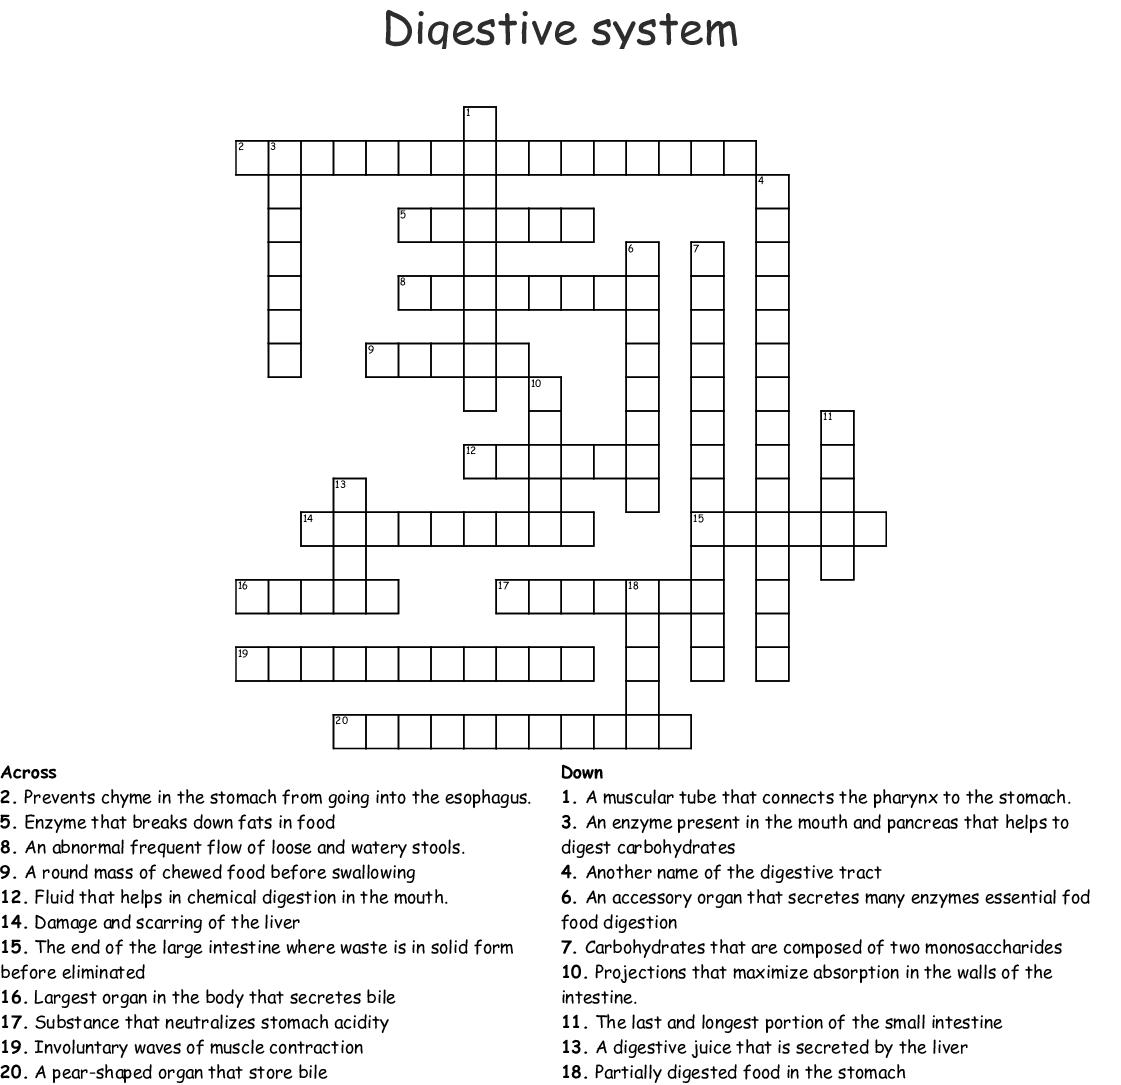 The Digestive System Crossword